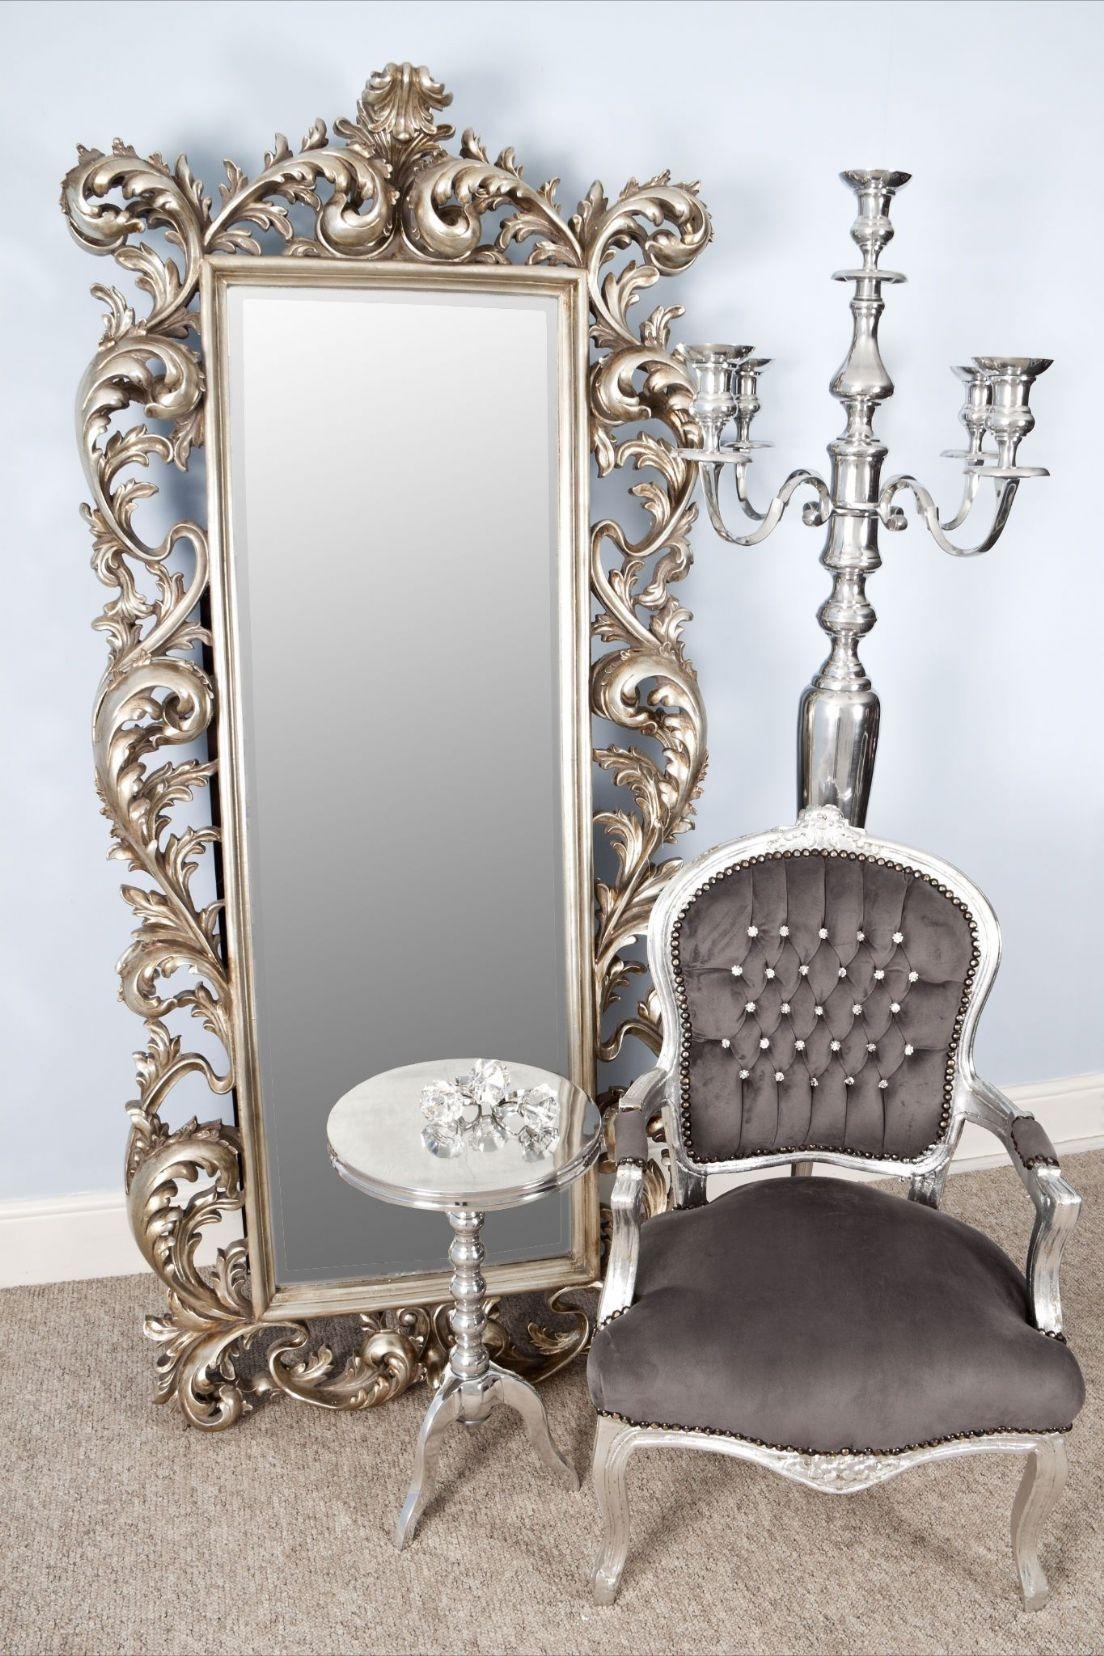 Bedroom Furniture Free Standing Mirror Wood Framed Mirrors Within Free Standing Silver Mirror (Image 5 of 15)